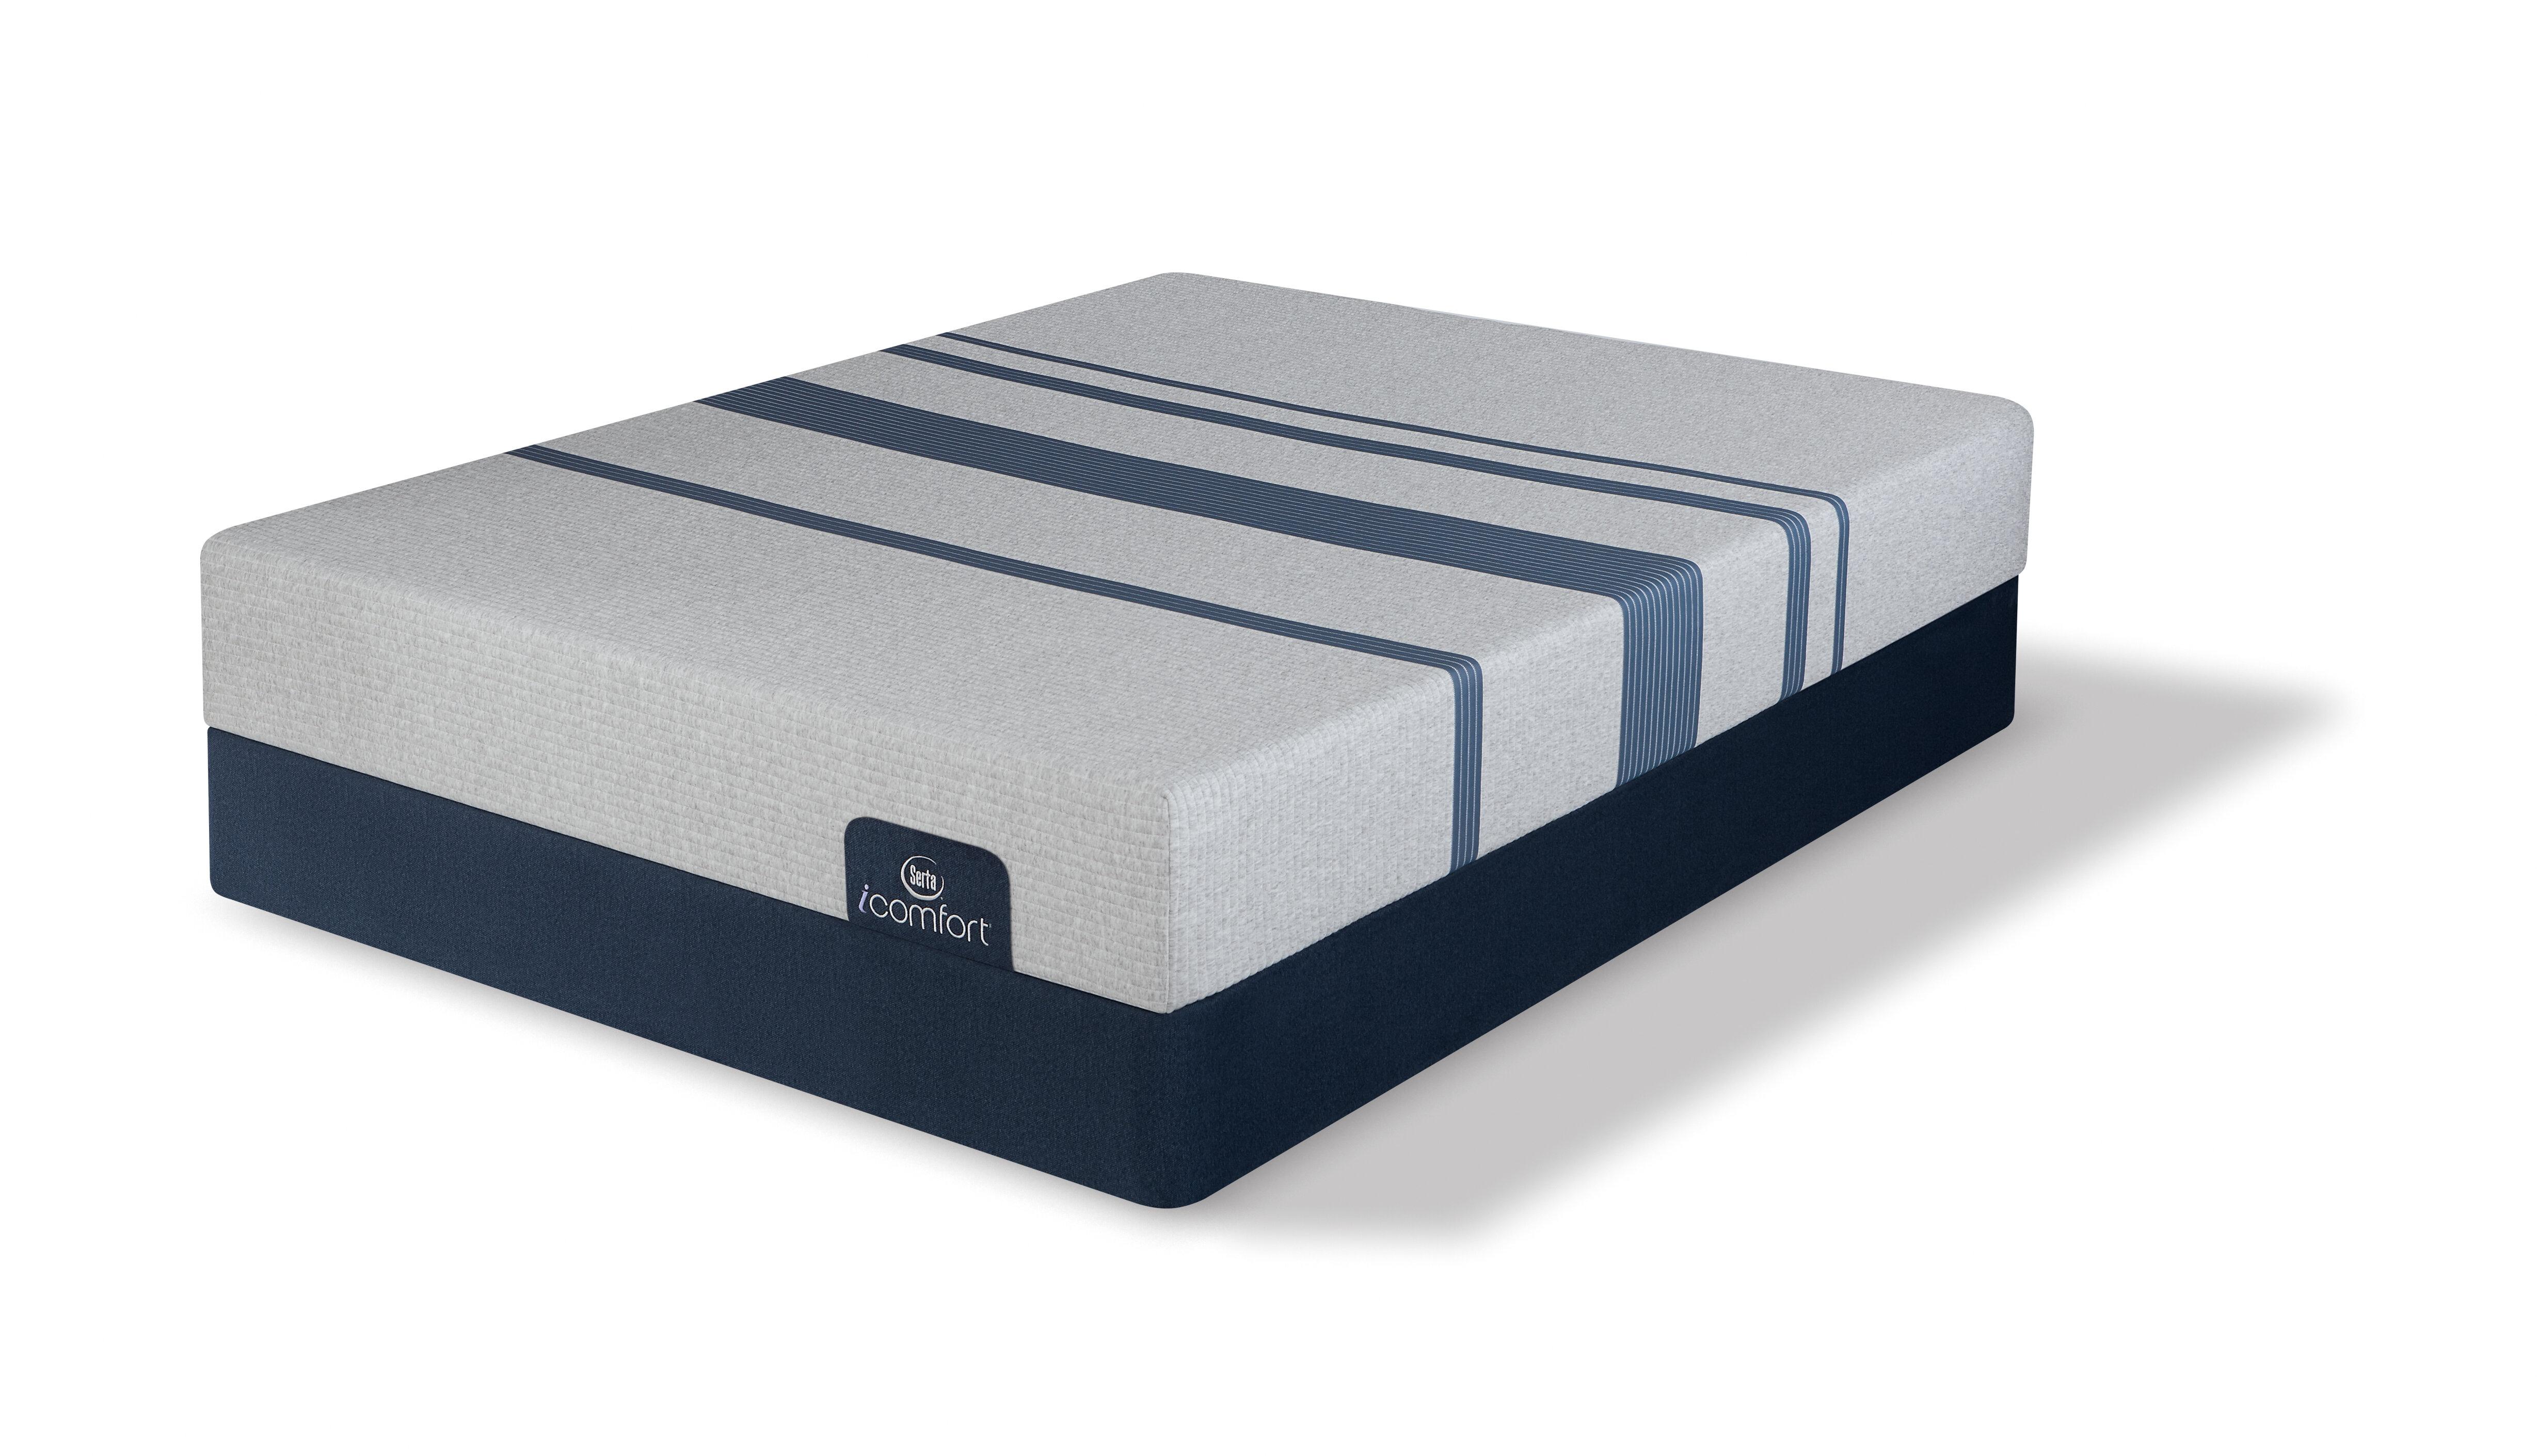 Icomfort 100 10 Firm Gel Memory Foam Mattress And 5 Low Profile